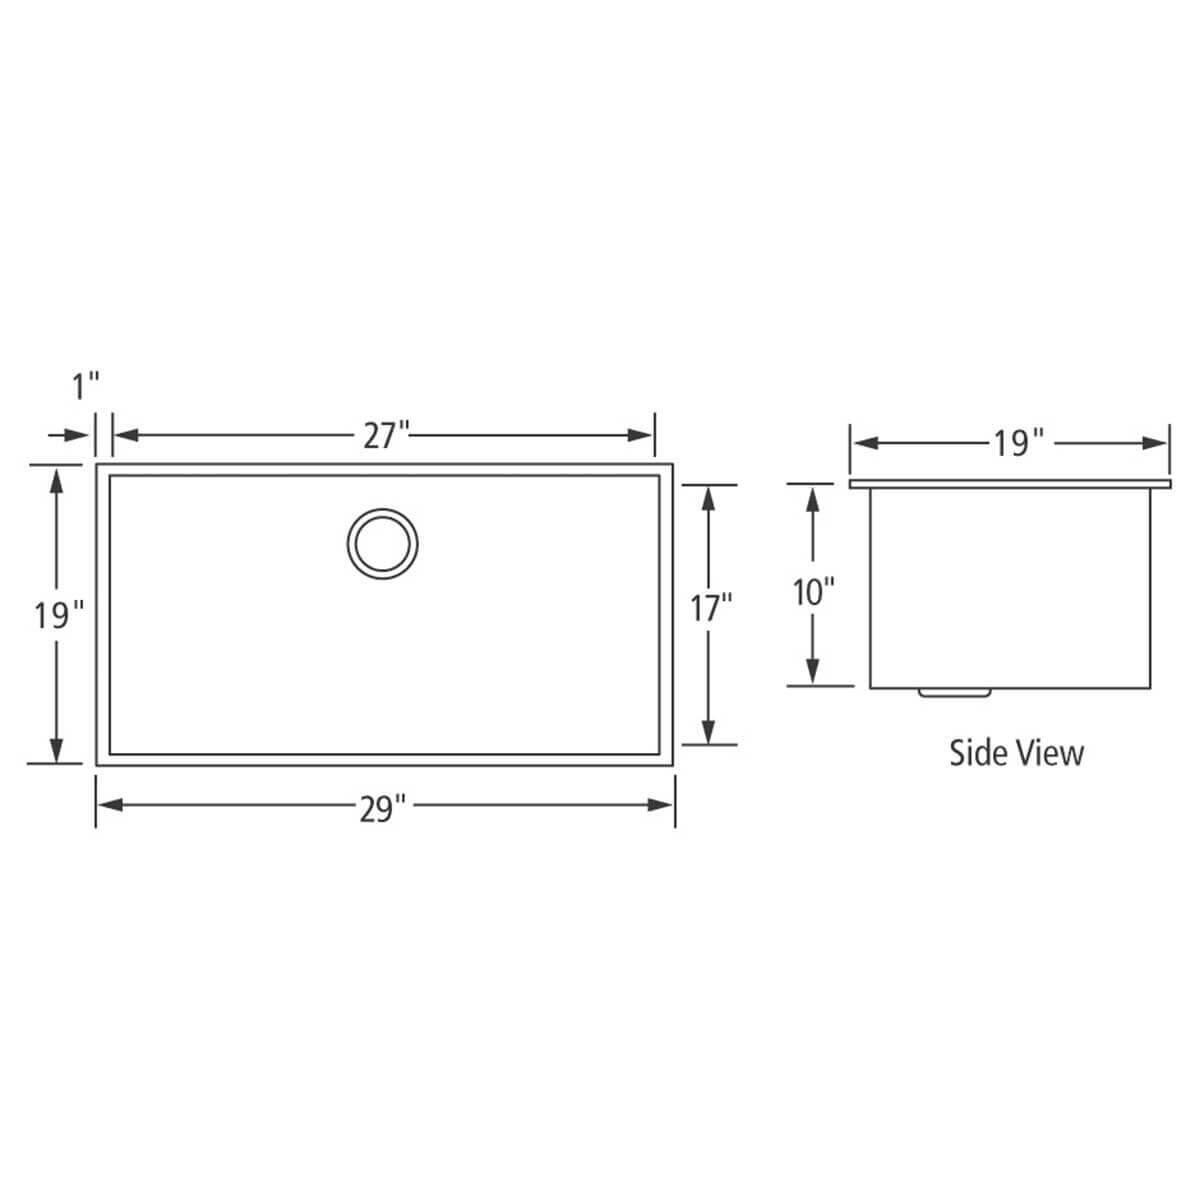 Artisan CPUZ2919-D10 Chef Pro Sink Dimensions